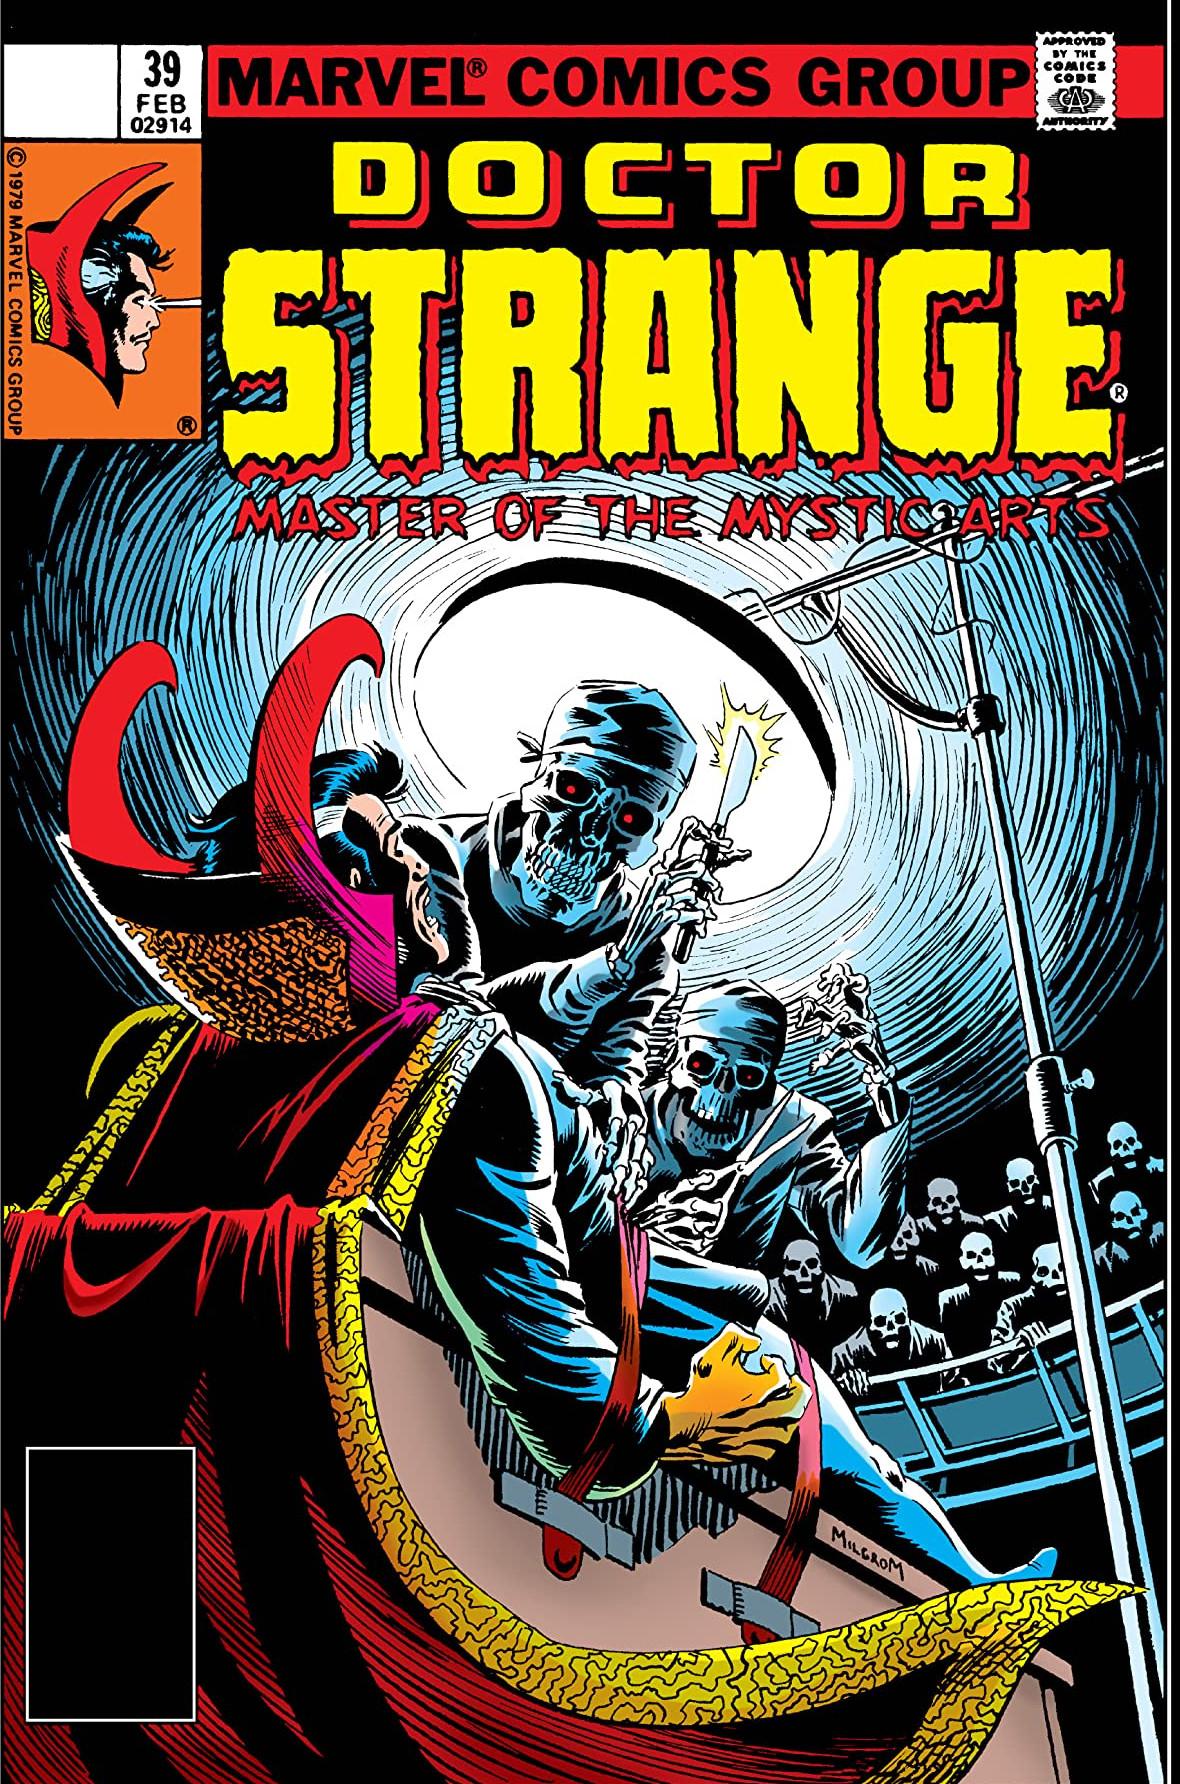 Doctor Strange Vol 2 39.jpg